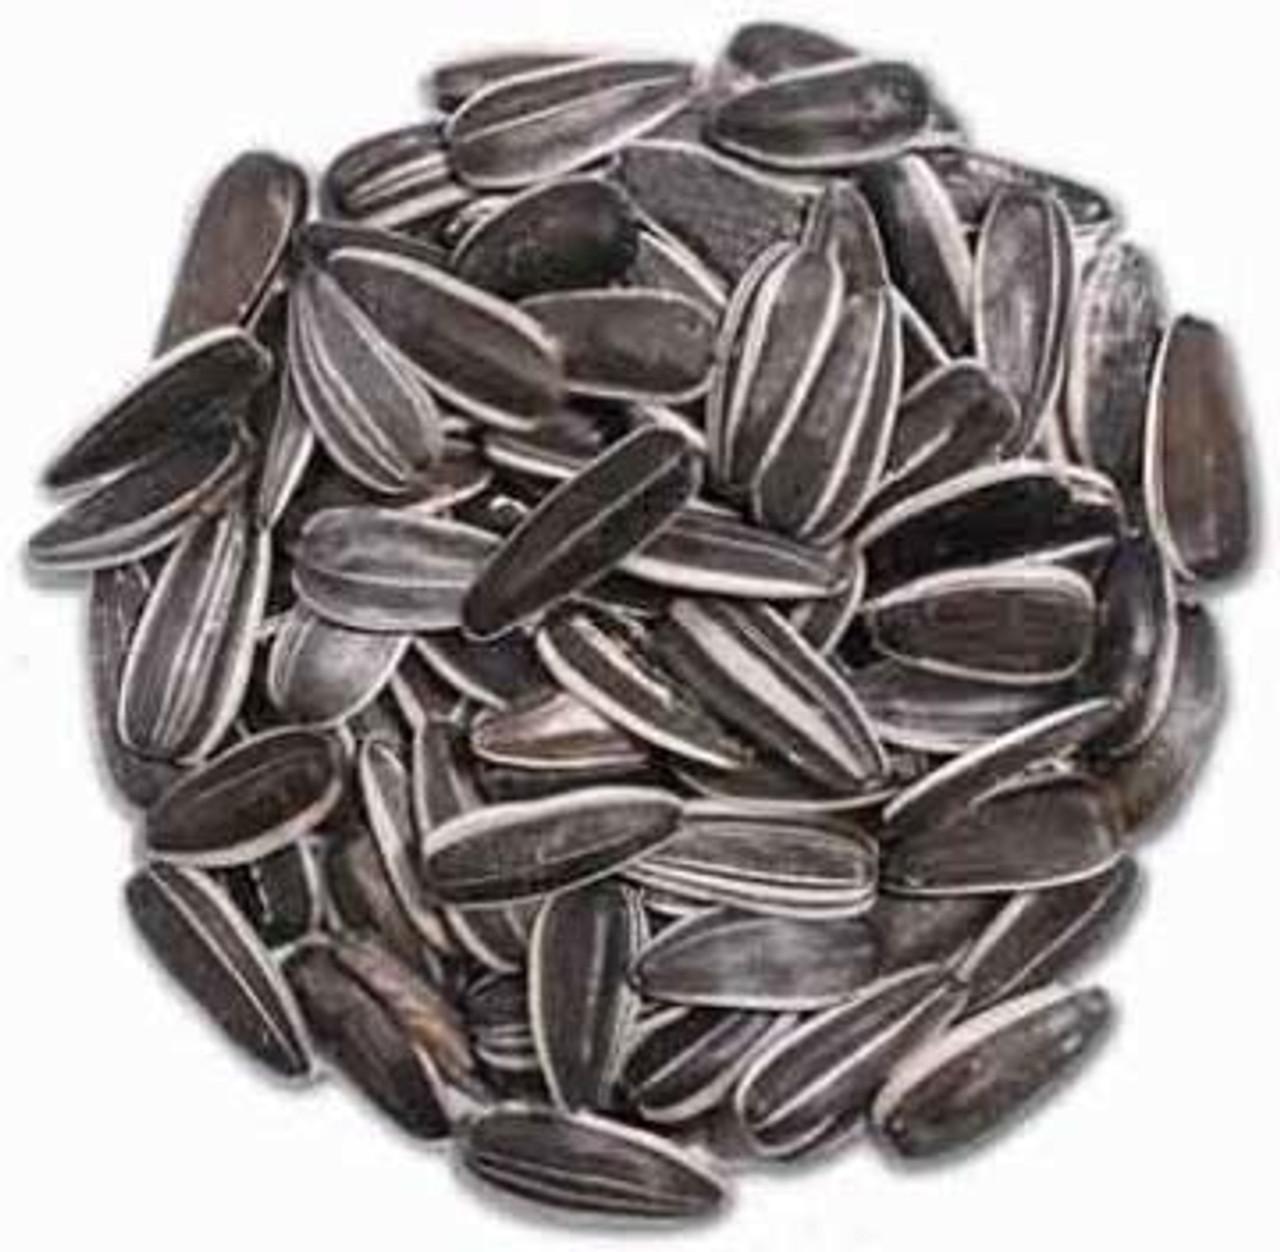 Bulk Striped Sunflower Seed